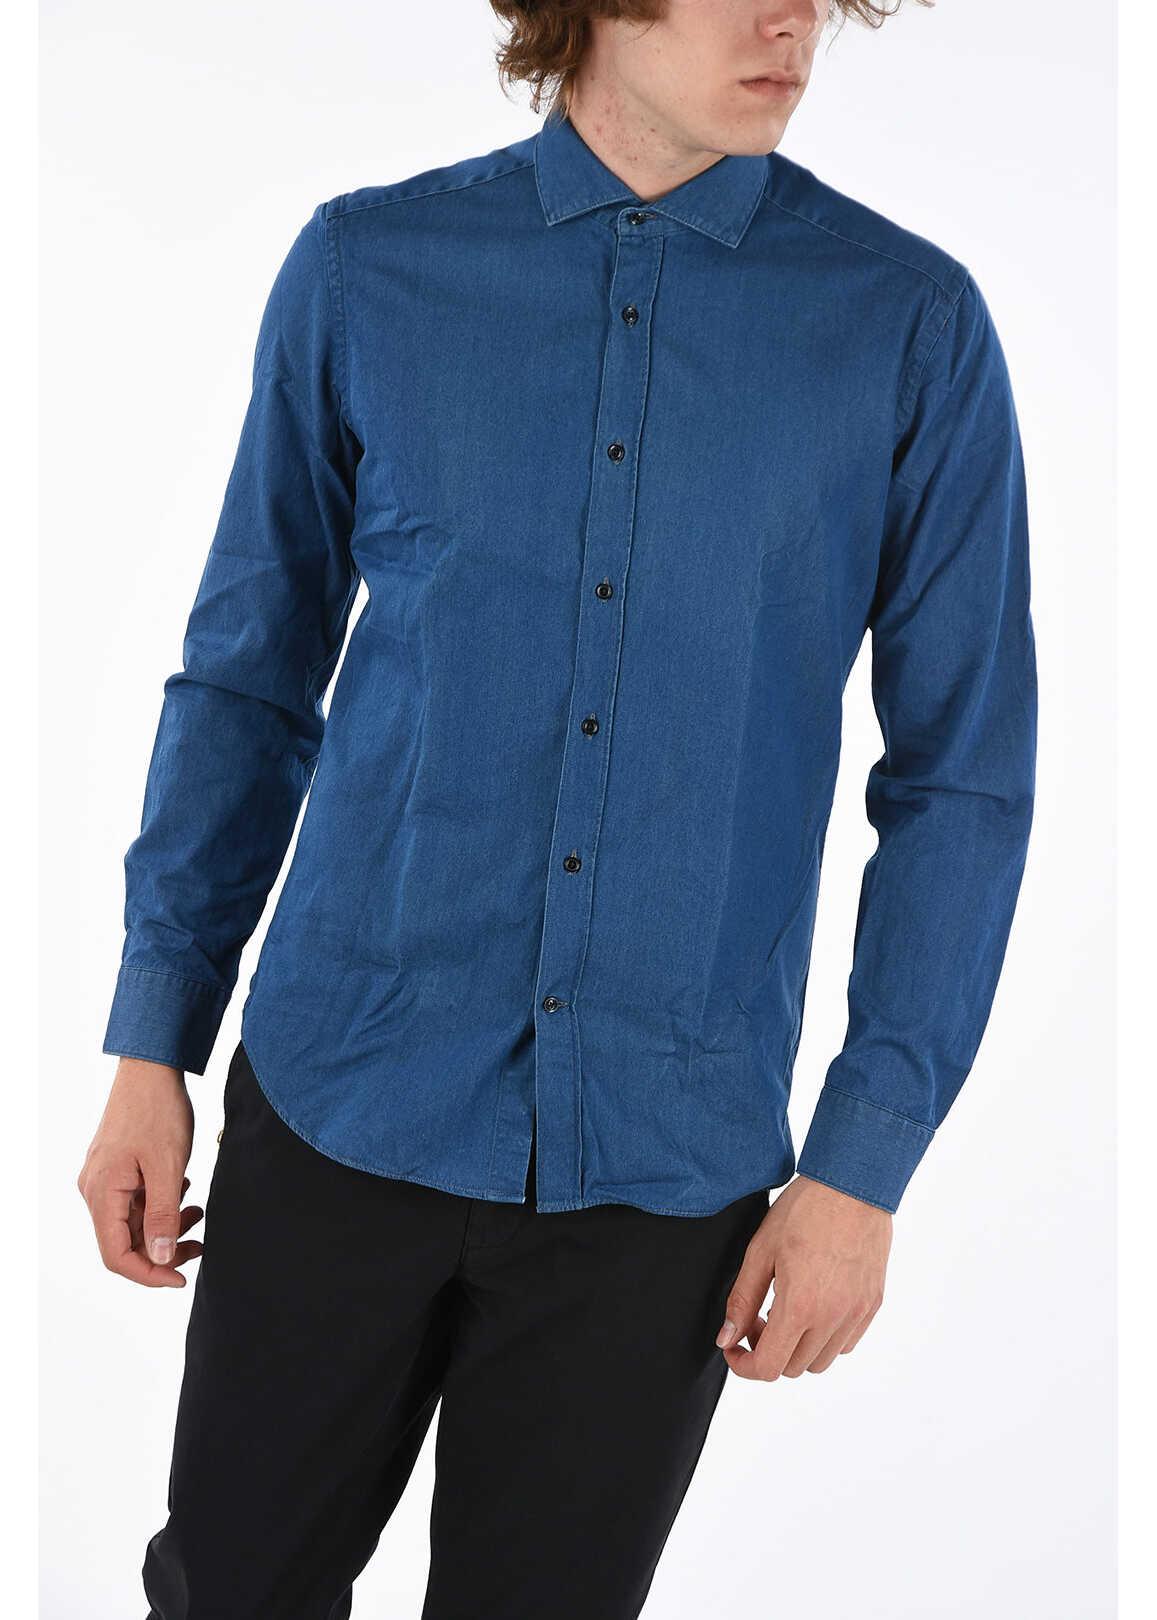 CORNELIANI CC COLLECTION Denim Slim Fit Shirt BLUE imagine